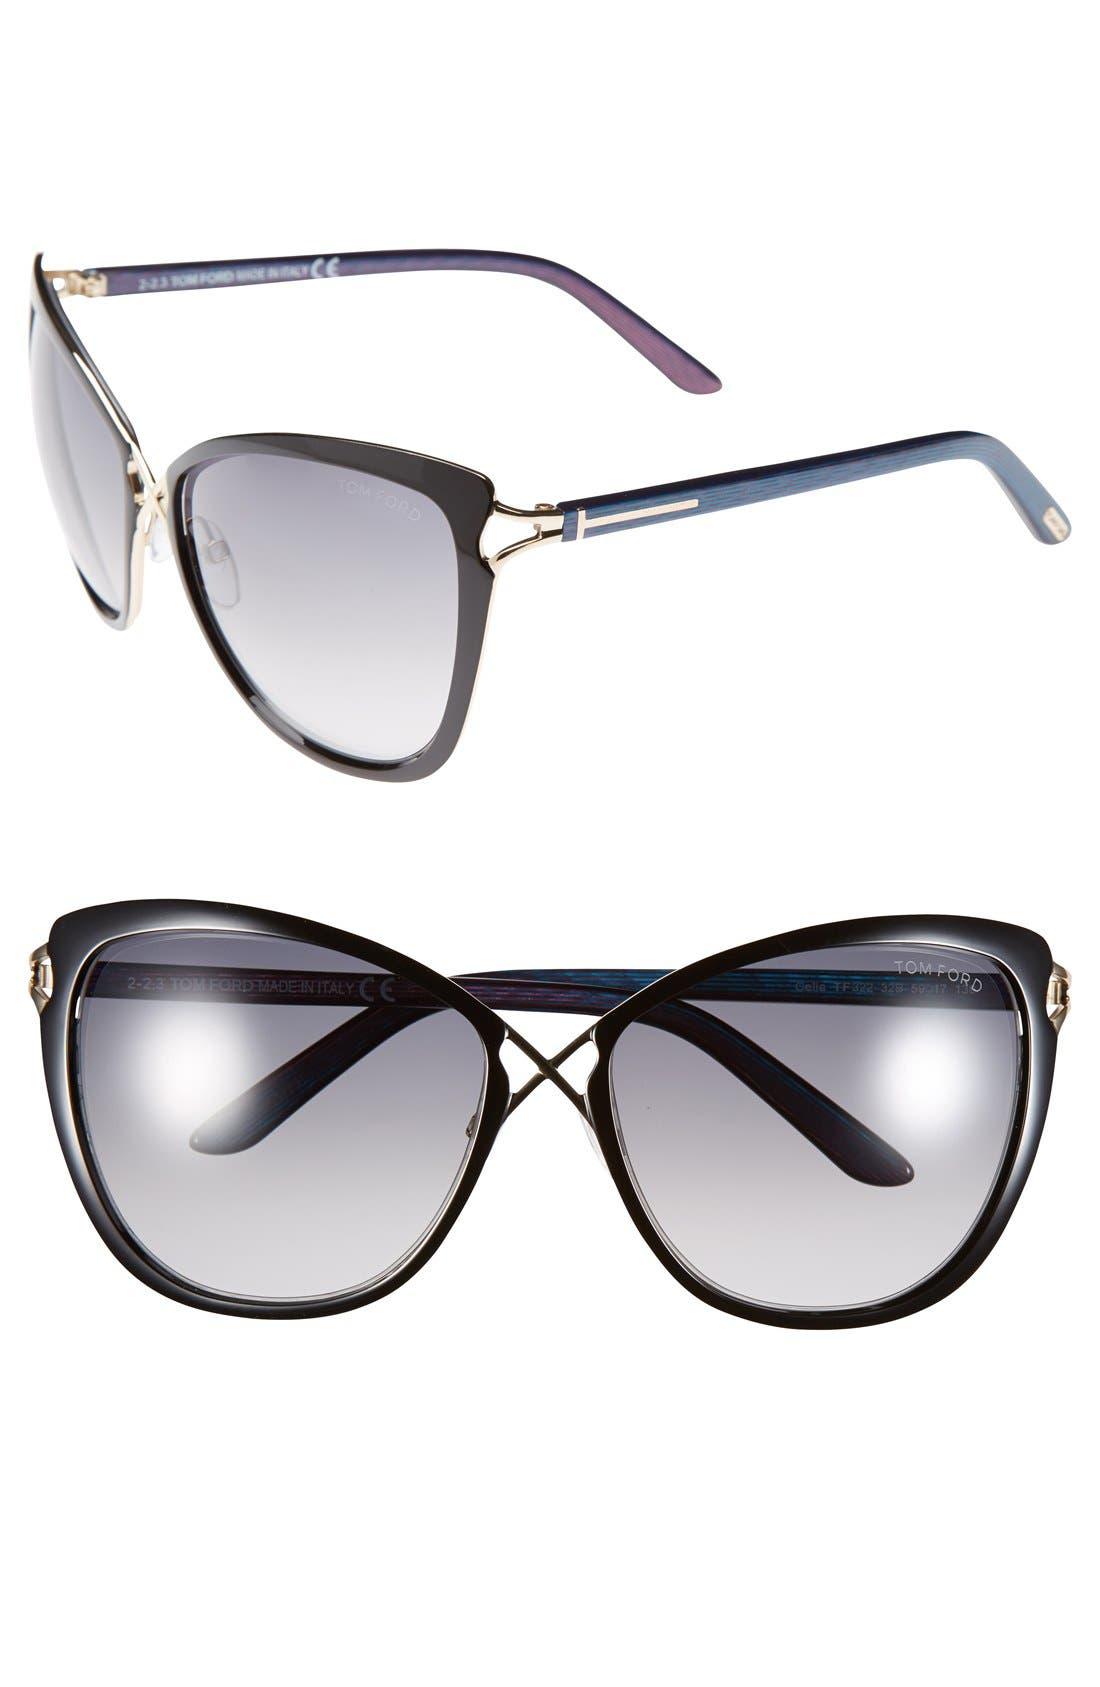 Alternate Image 1 Selected - Tom Ford 'Celia' 59mm Cat Eye Sunglasses